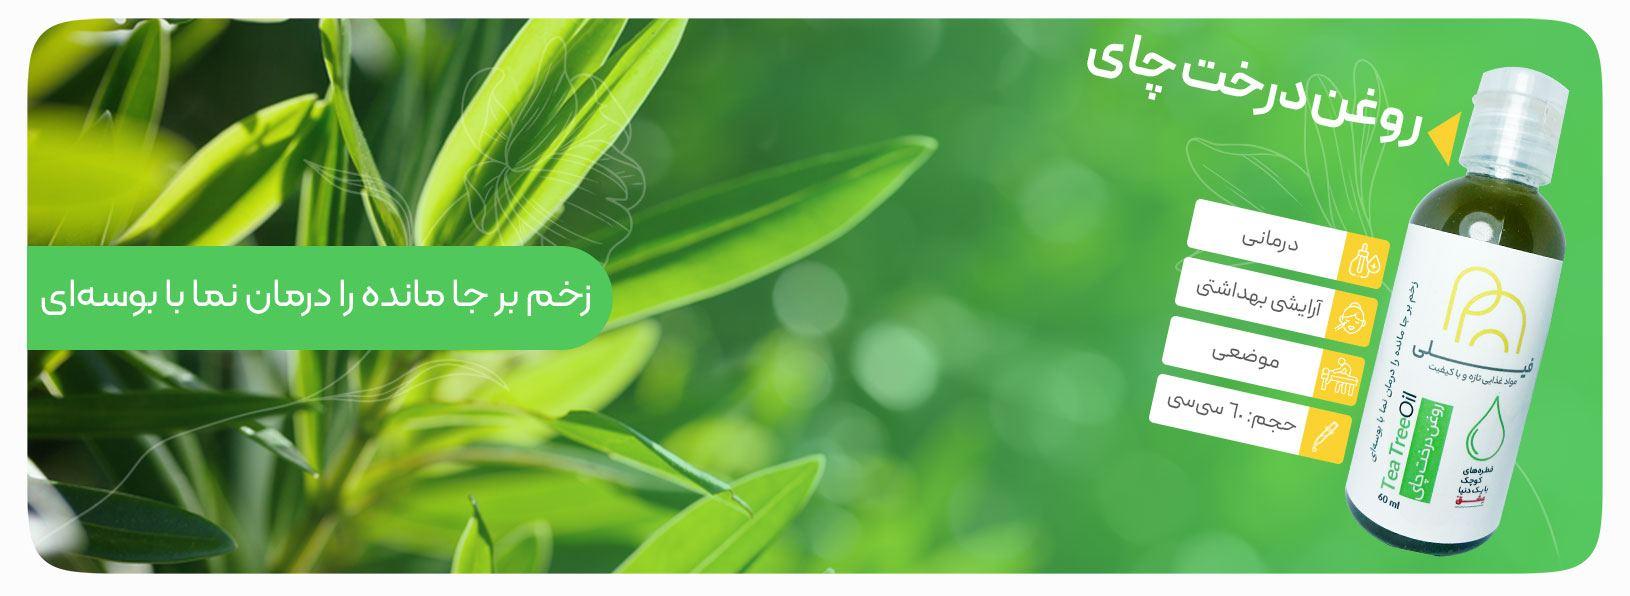 مشخصات روغن درخت چای